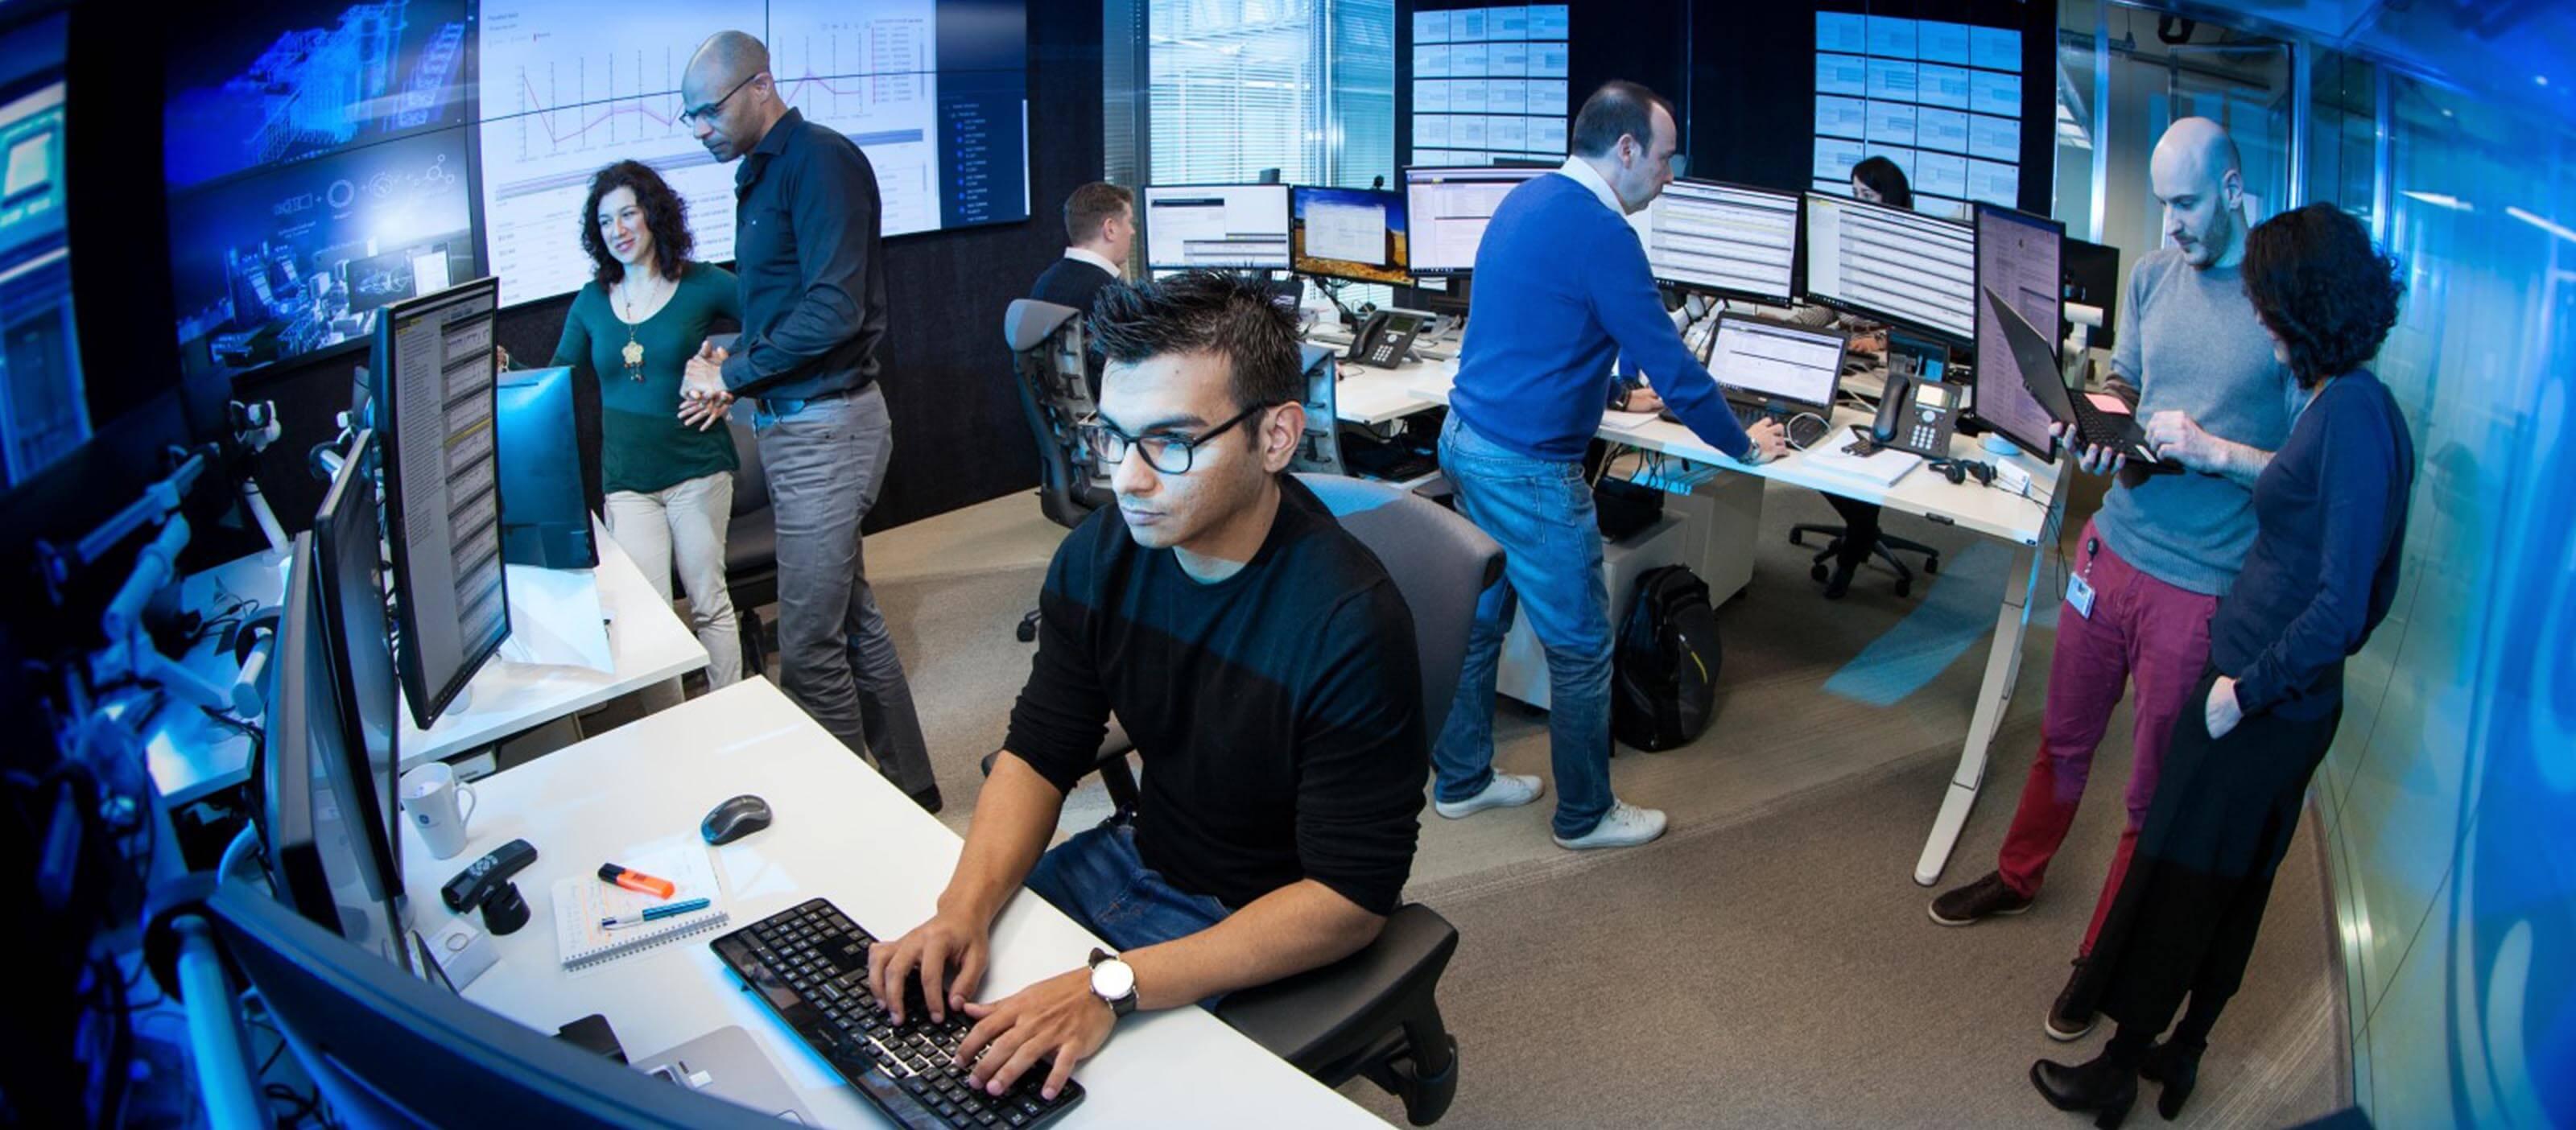 Industrial Managed Services | GE Digital | IIoTIndustrial Managed Services | GE Digital | IIoT